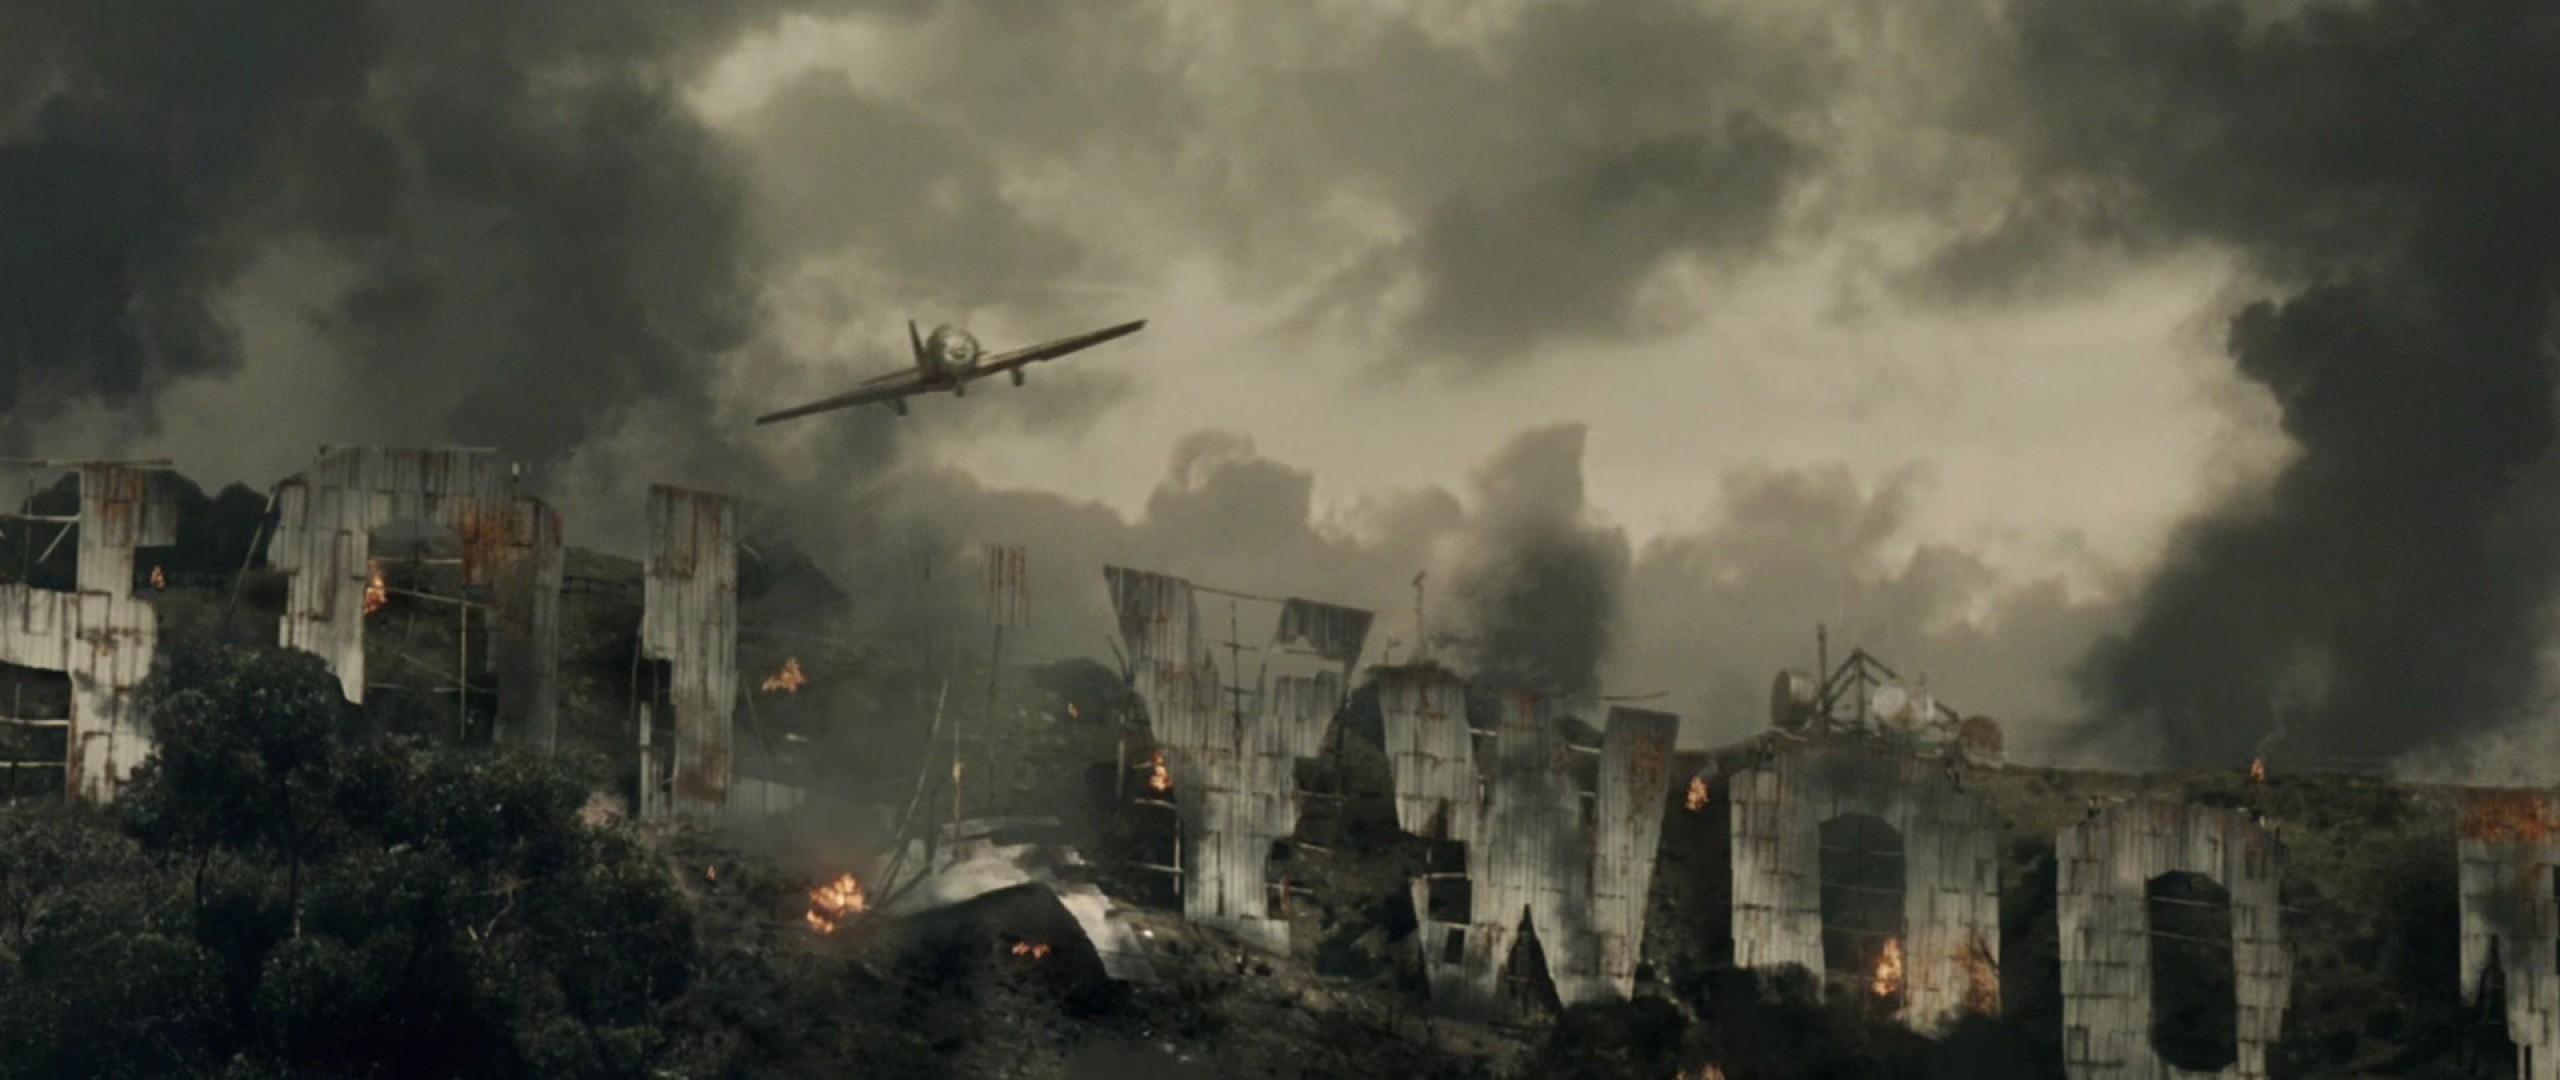 fire apocalypse background - photo #25